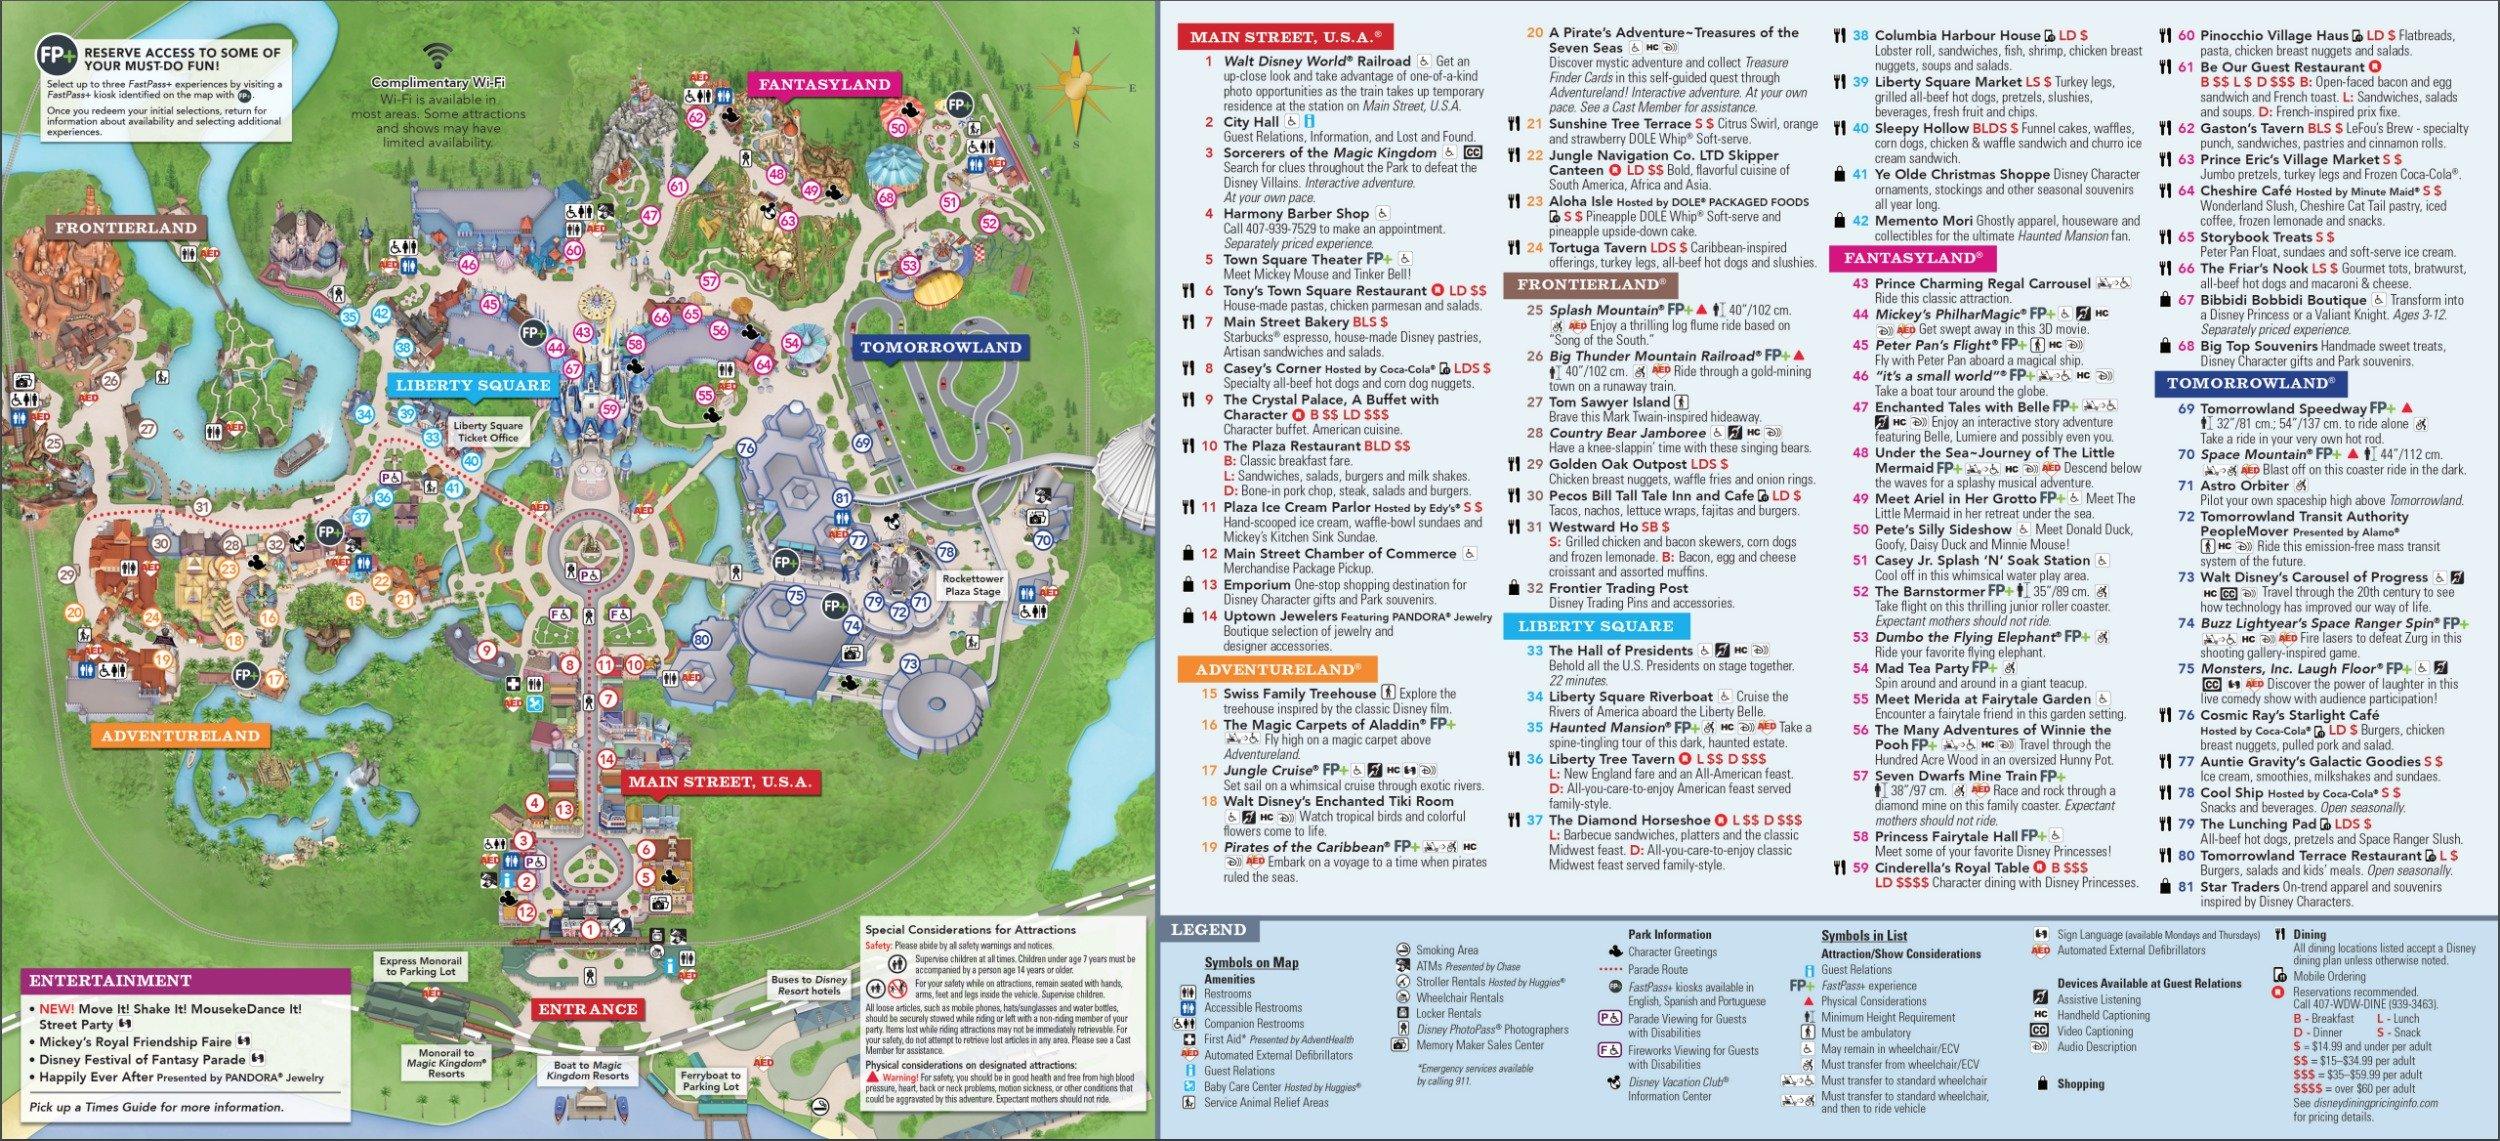 Magic Kingdom Park Map - Walt Disney World